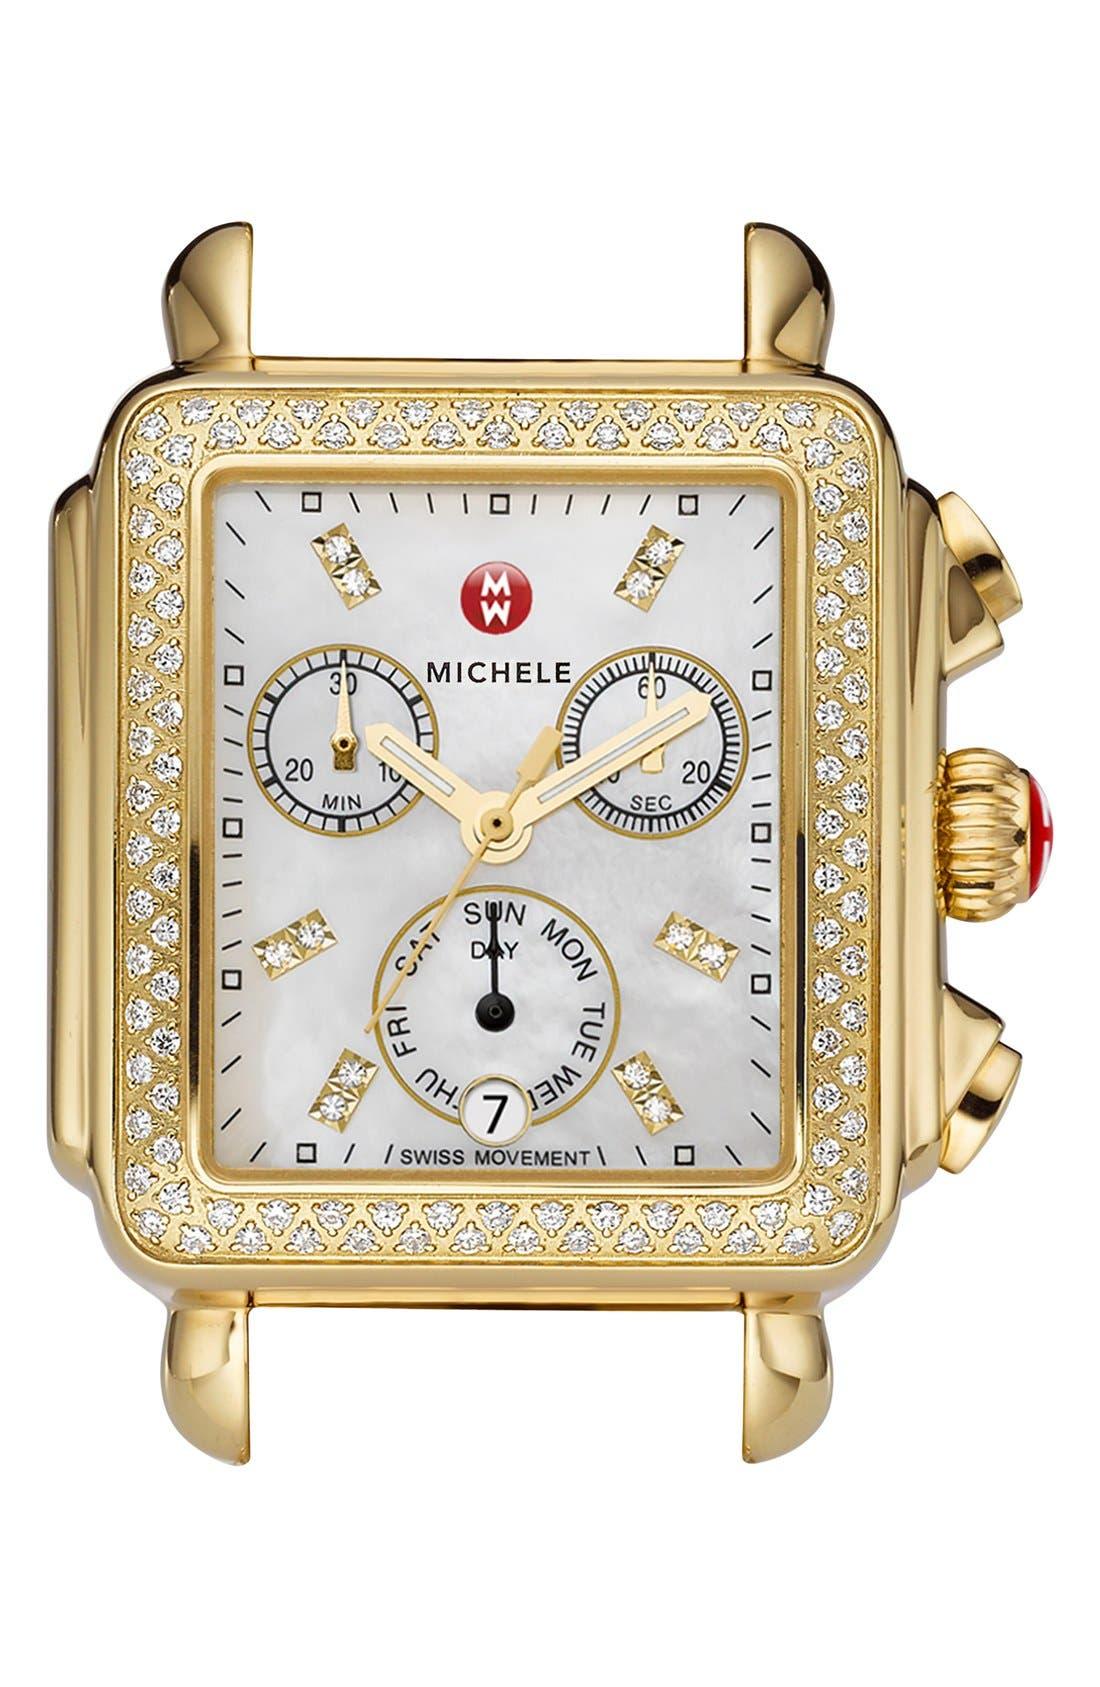 Main Image - MICHELE Deco Diamond Diamond Dial Gold Plated Watch Case, 33mm x 35mm